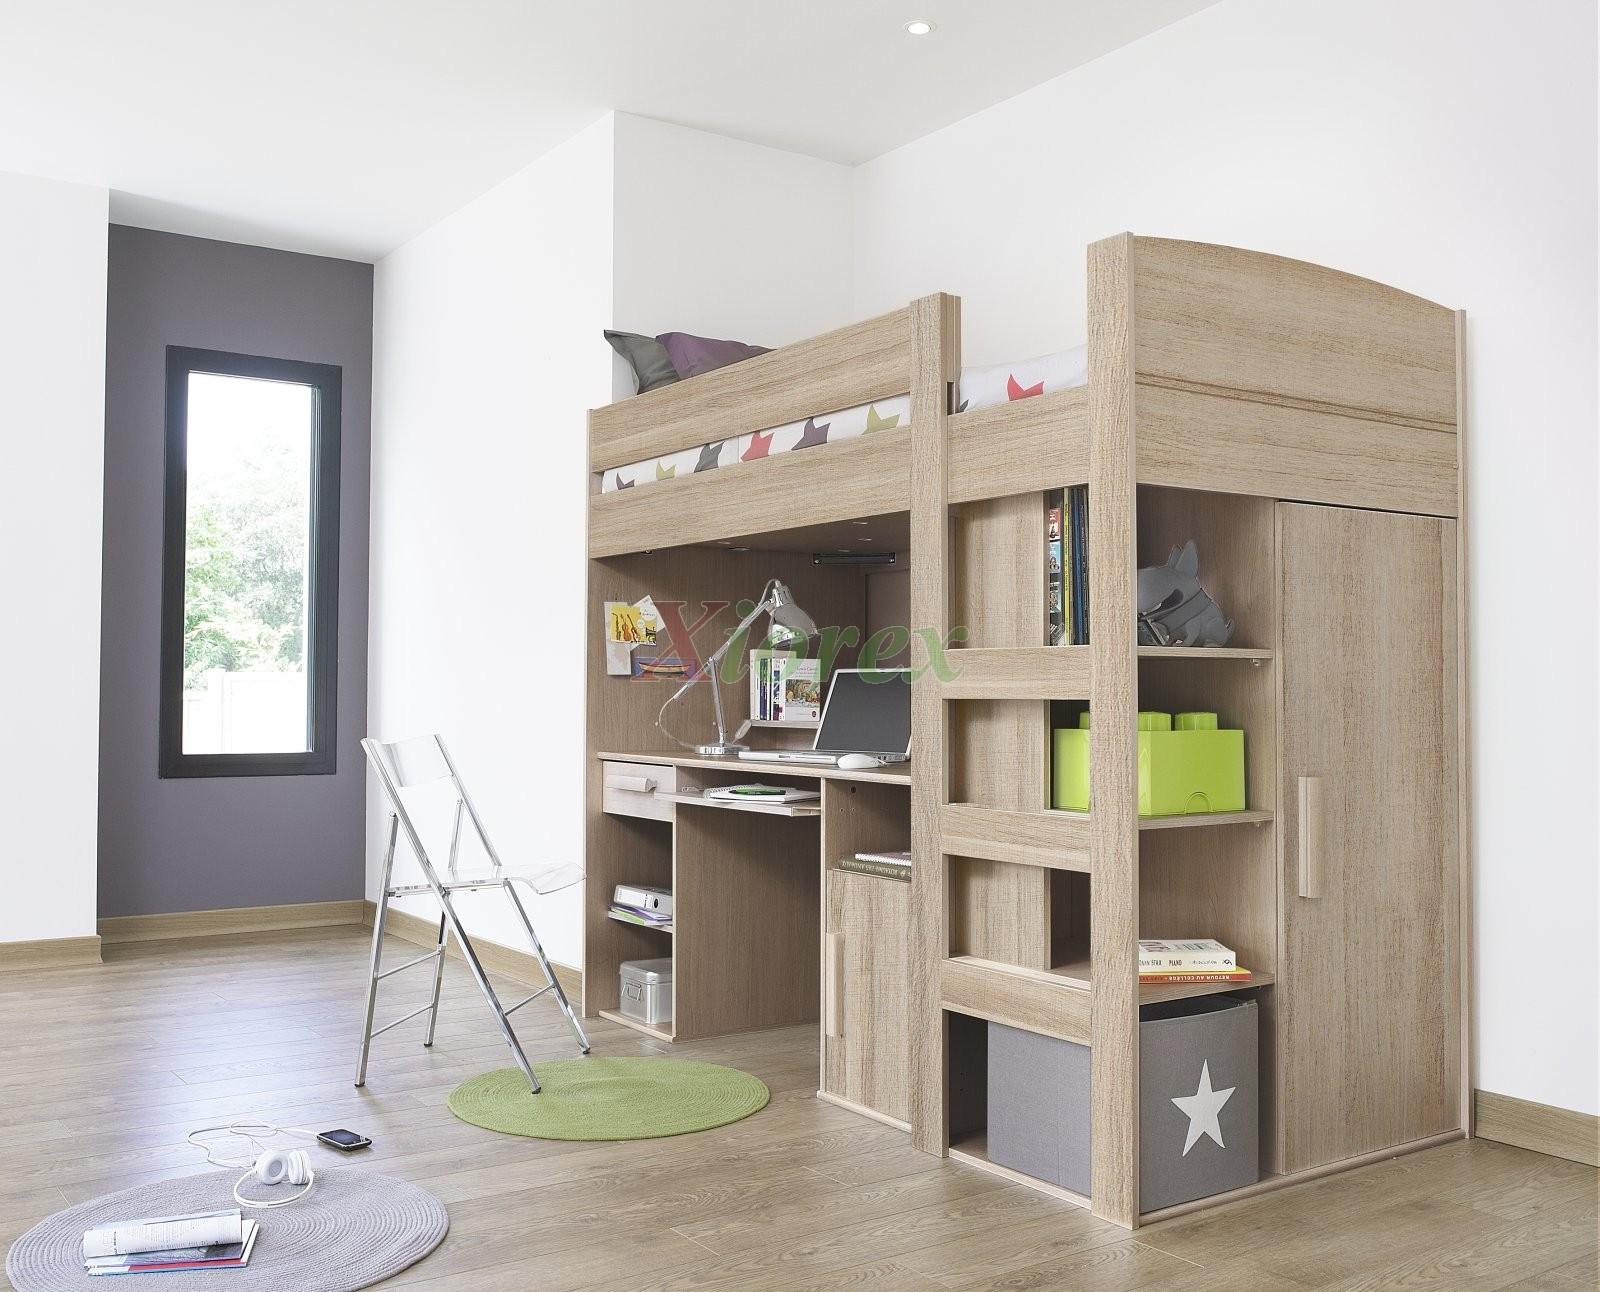 Gami Montana Loft Beds With Desk Closet Amp Storage